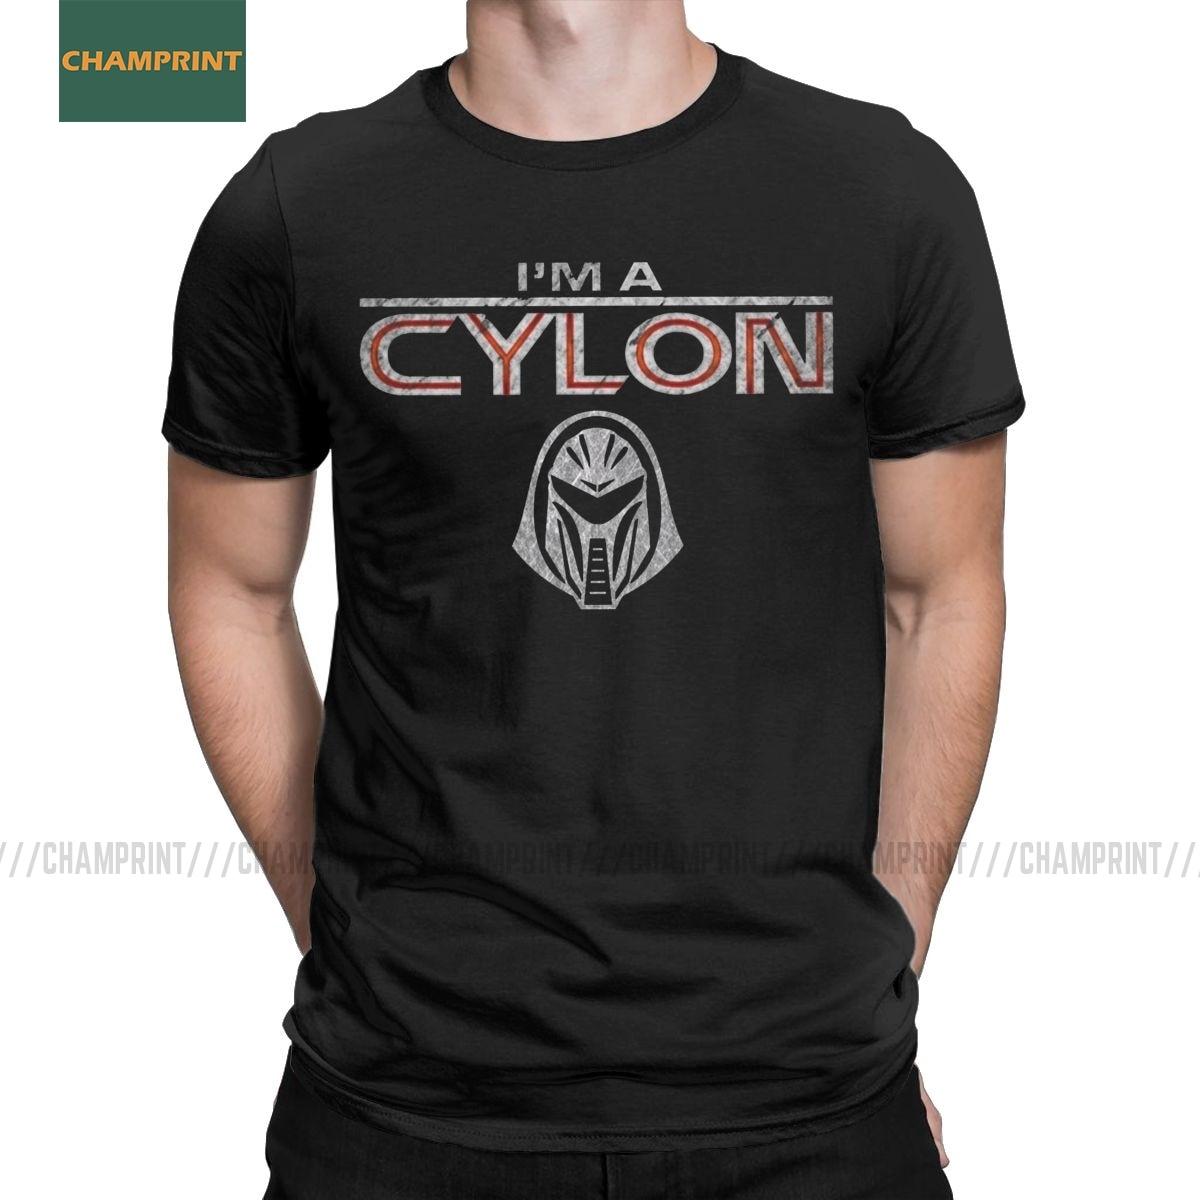 Camisetas de hombre soy un cylón Battlestar Galactica Camiseta de algodón de manga corta de la Oficina Michael Camiseta de cuello redondo